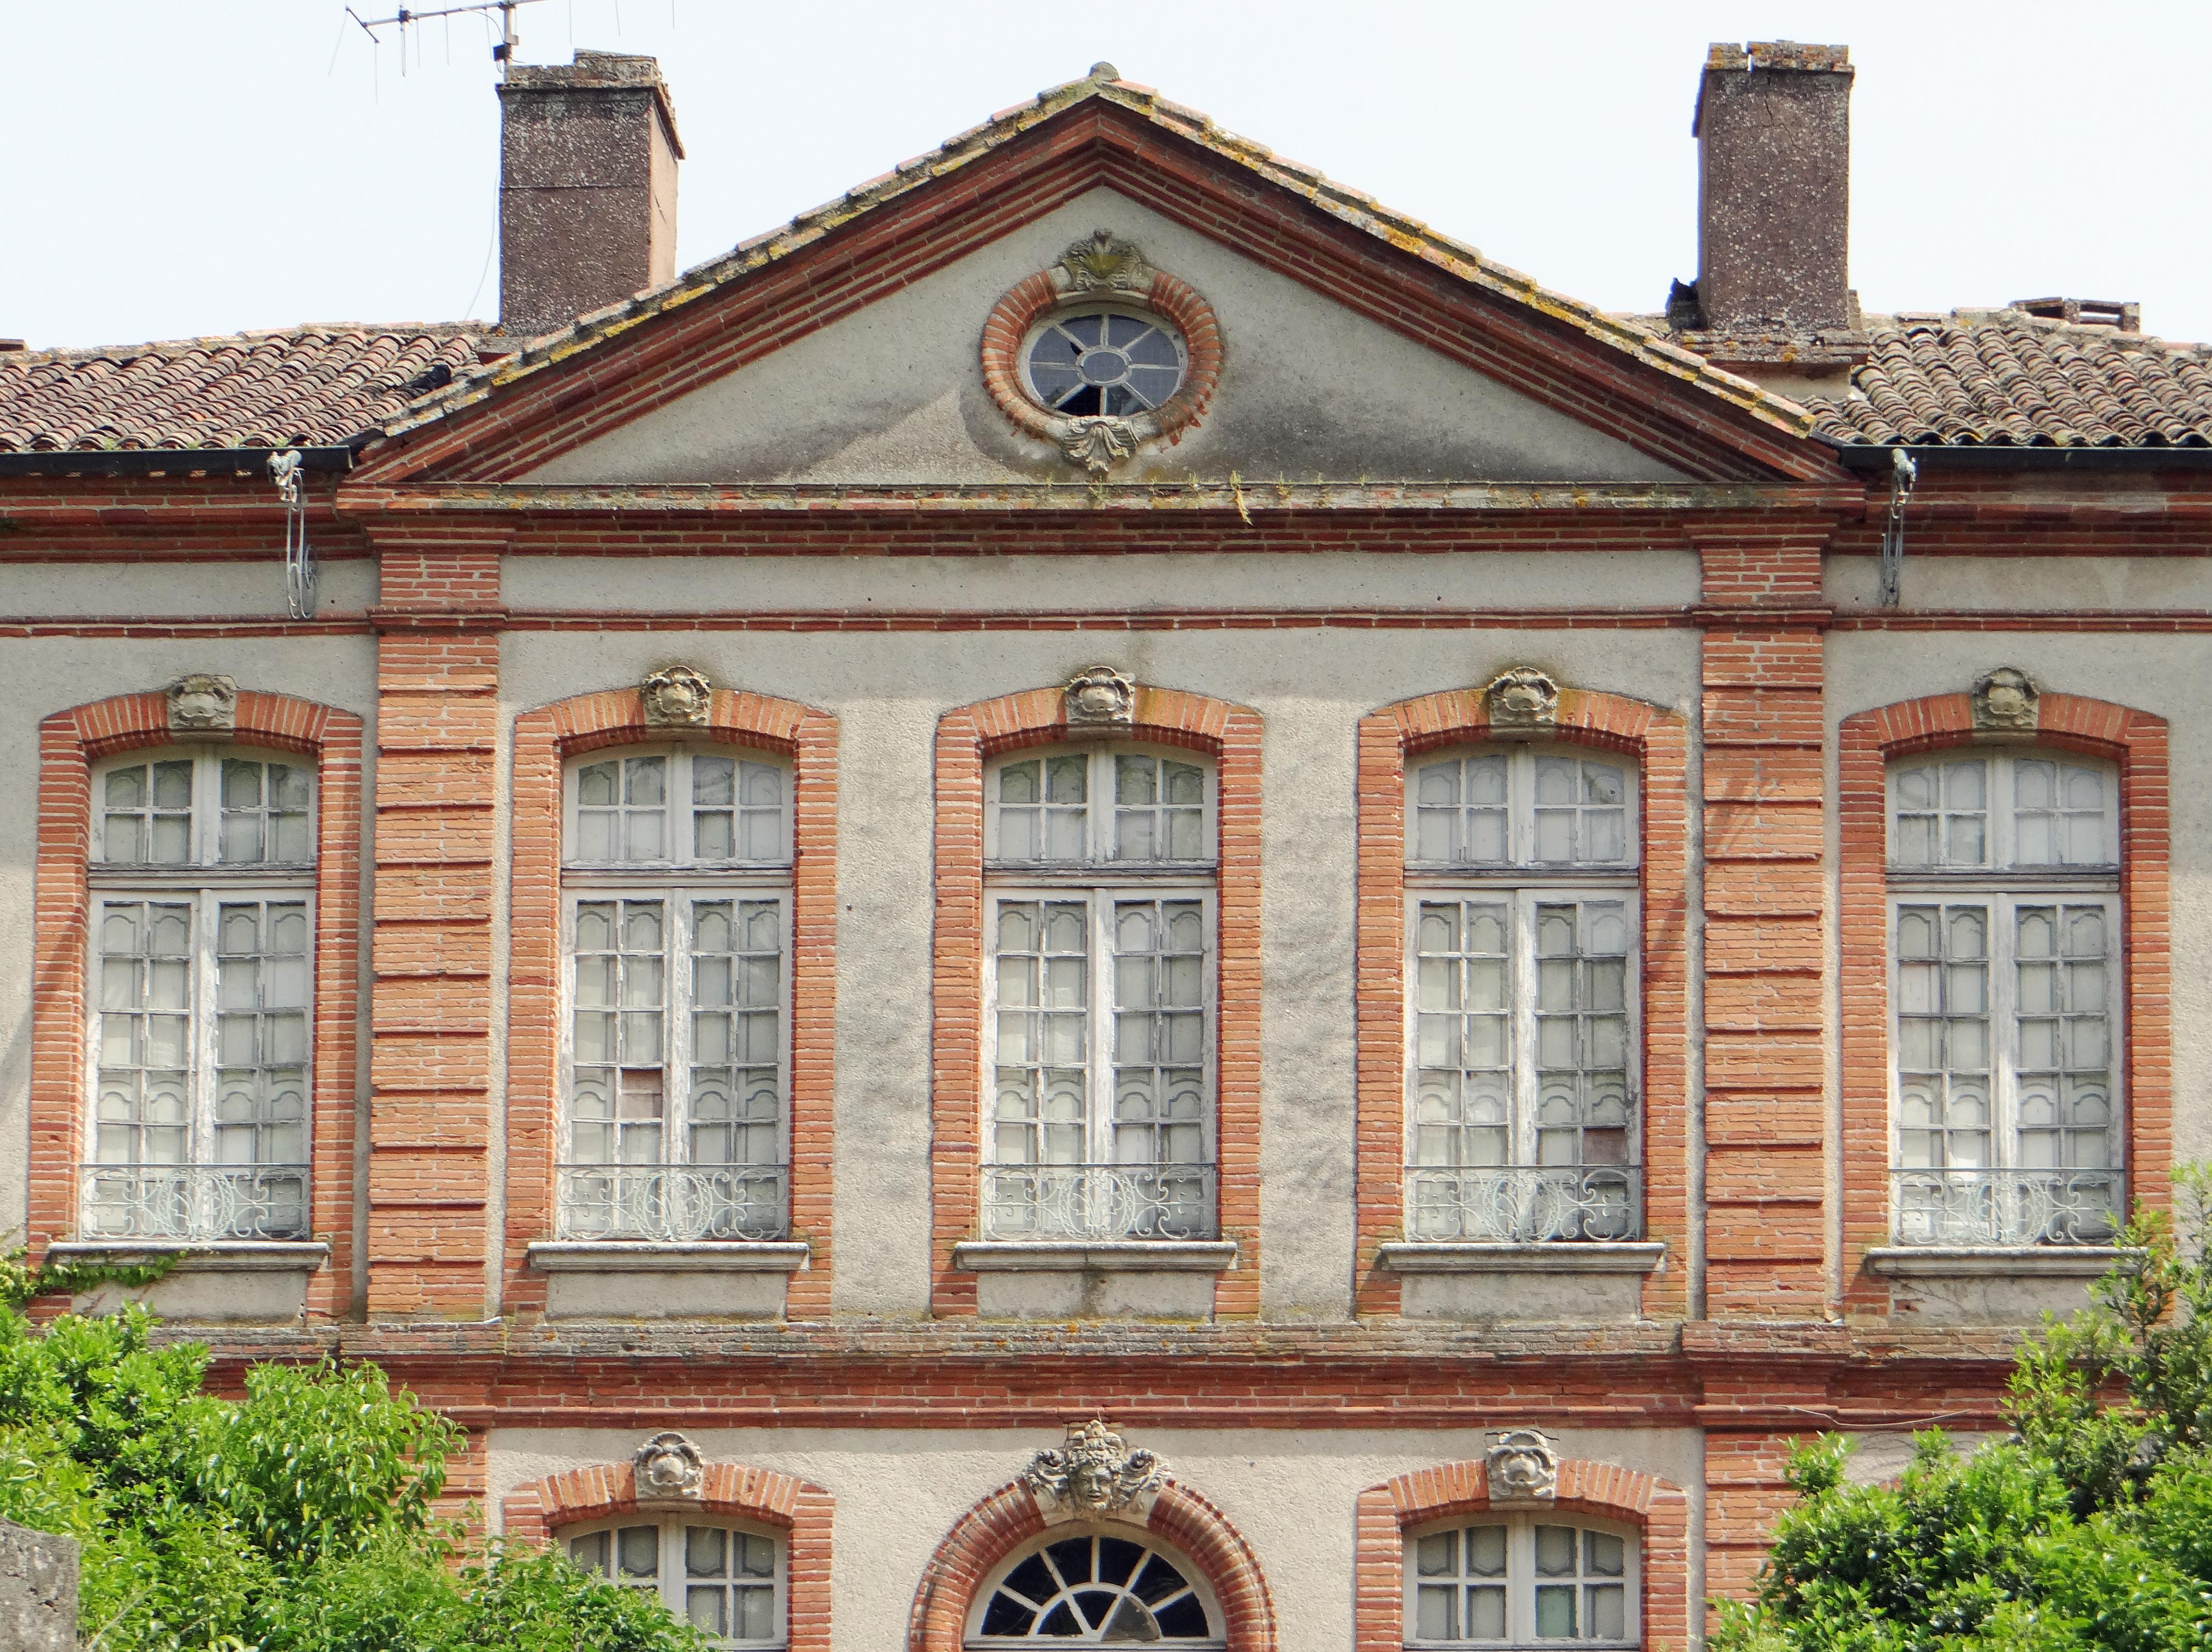 File:Agen - H\u00f4tel Hutot de Latour -5.JPG - Wikimedia Commons